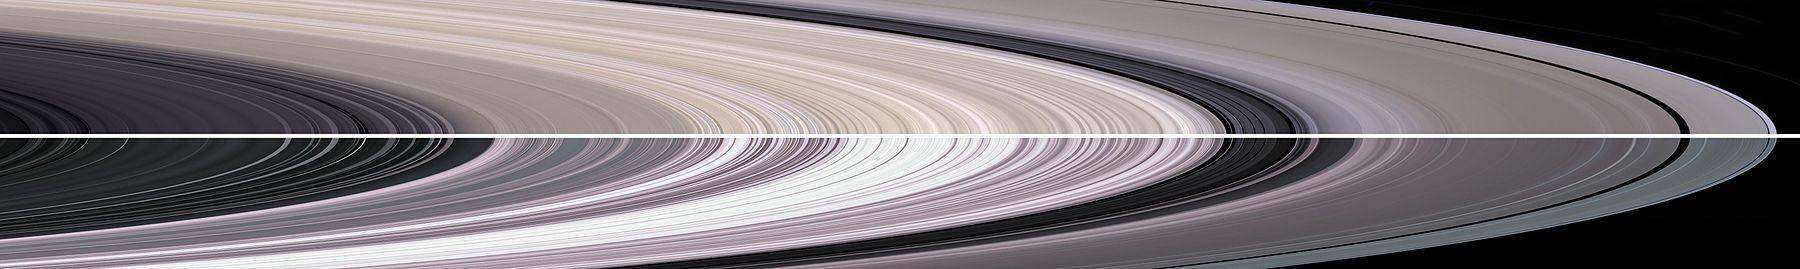 ru53-sputniki-saturna-chast-ii_27